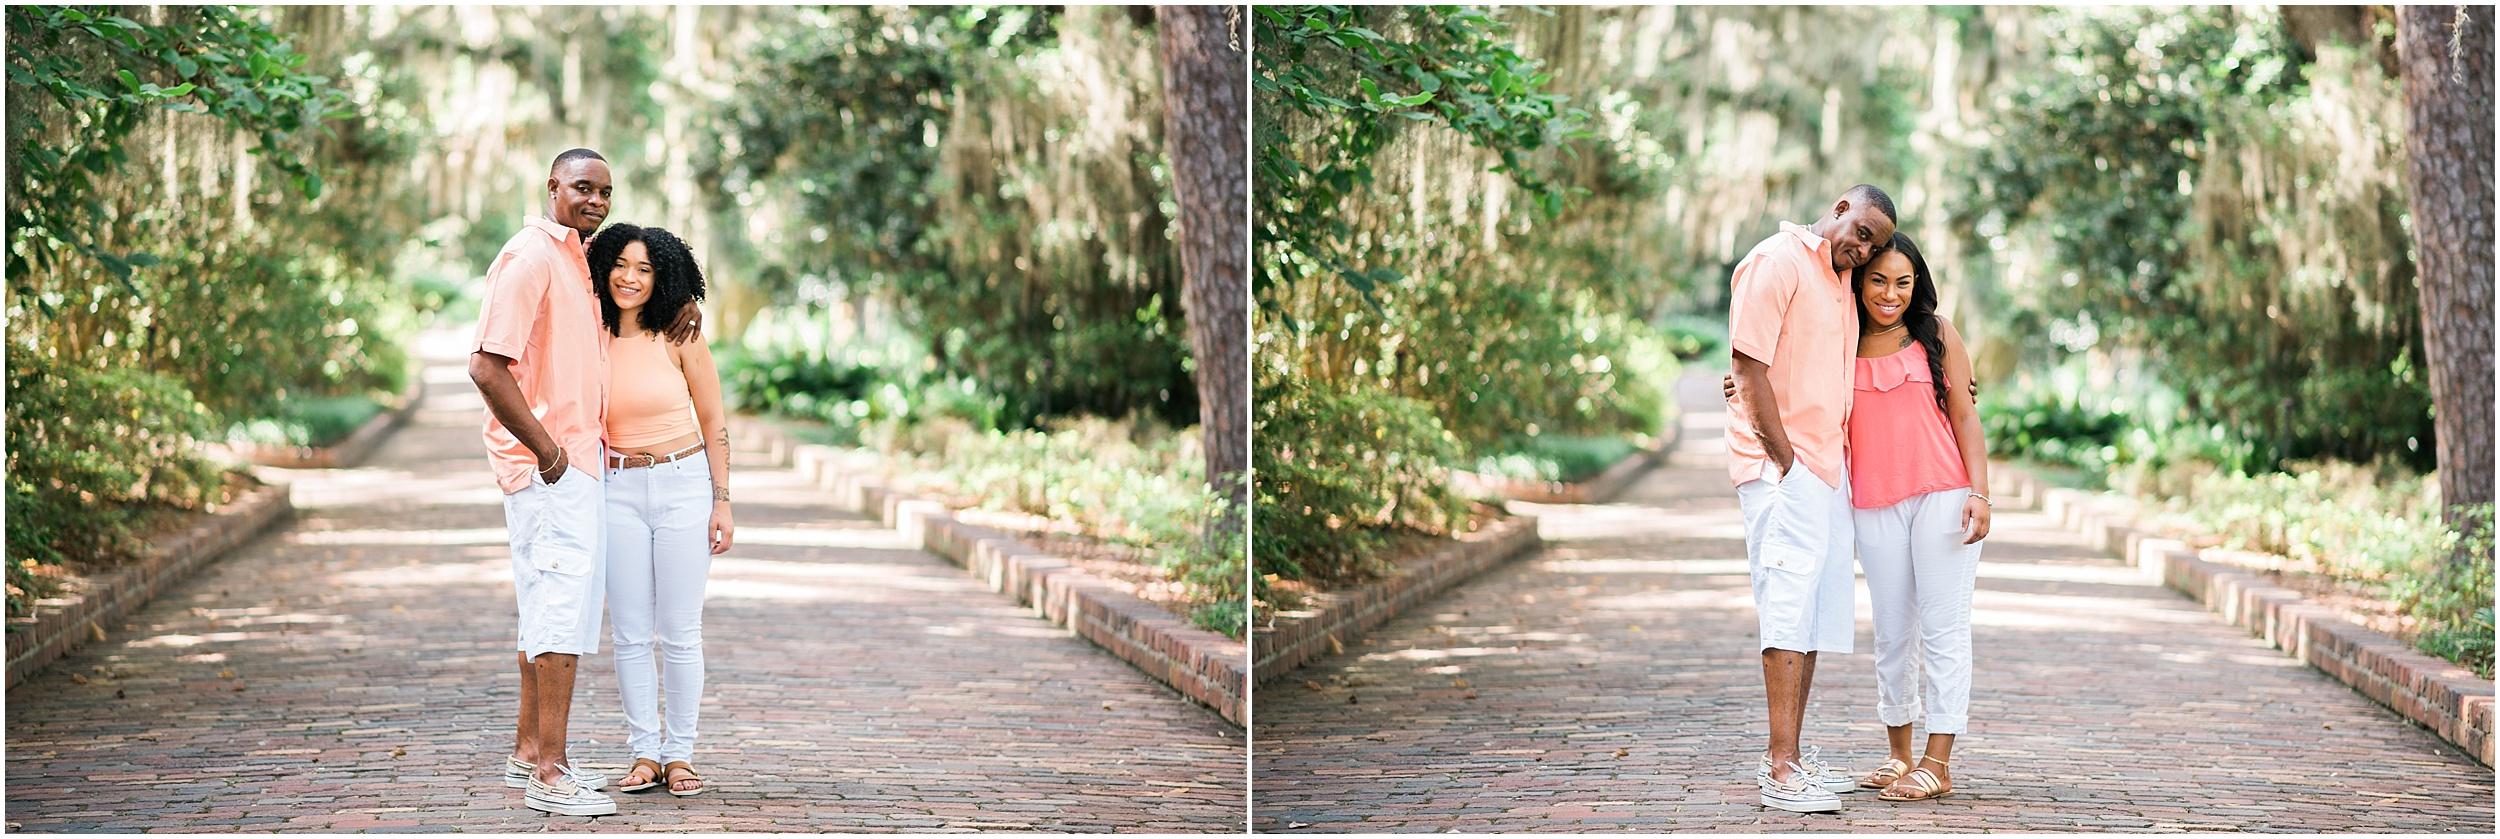 Bolden Family Session, Maclay Gardens Tallahassee Florida_0005.jpg